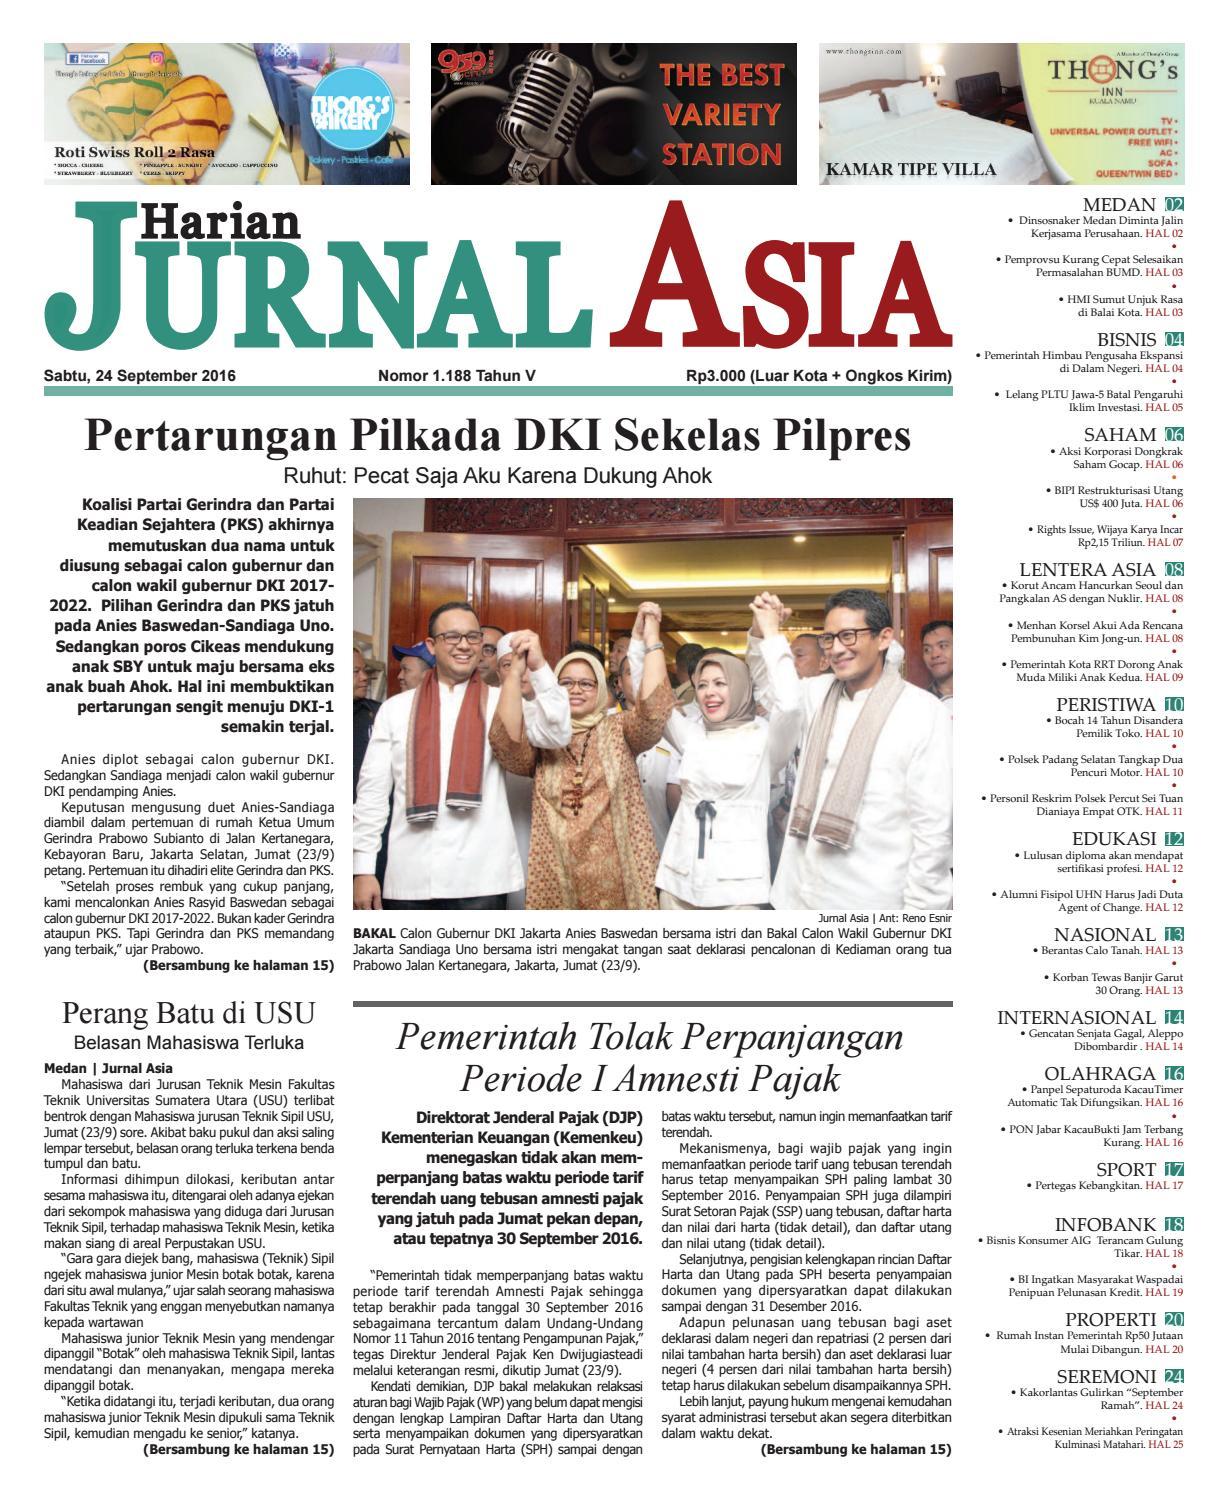 Harian Jurnal Asia Edisi Sabtu, 24 September 2016 by Harian Jurnal Asia - Medan - issuu